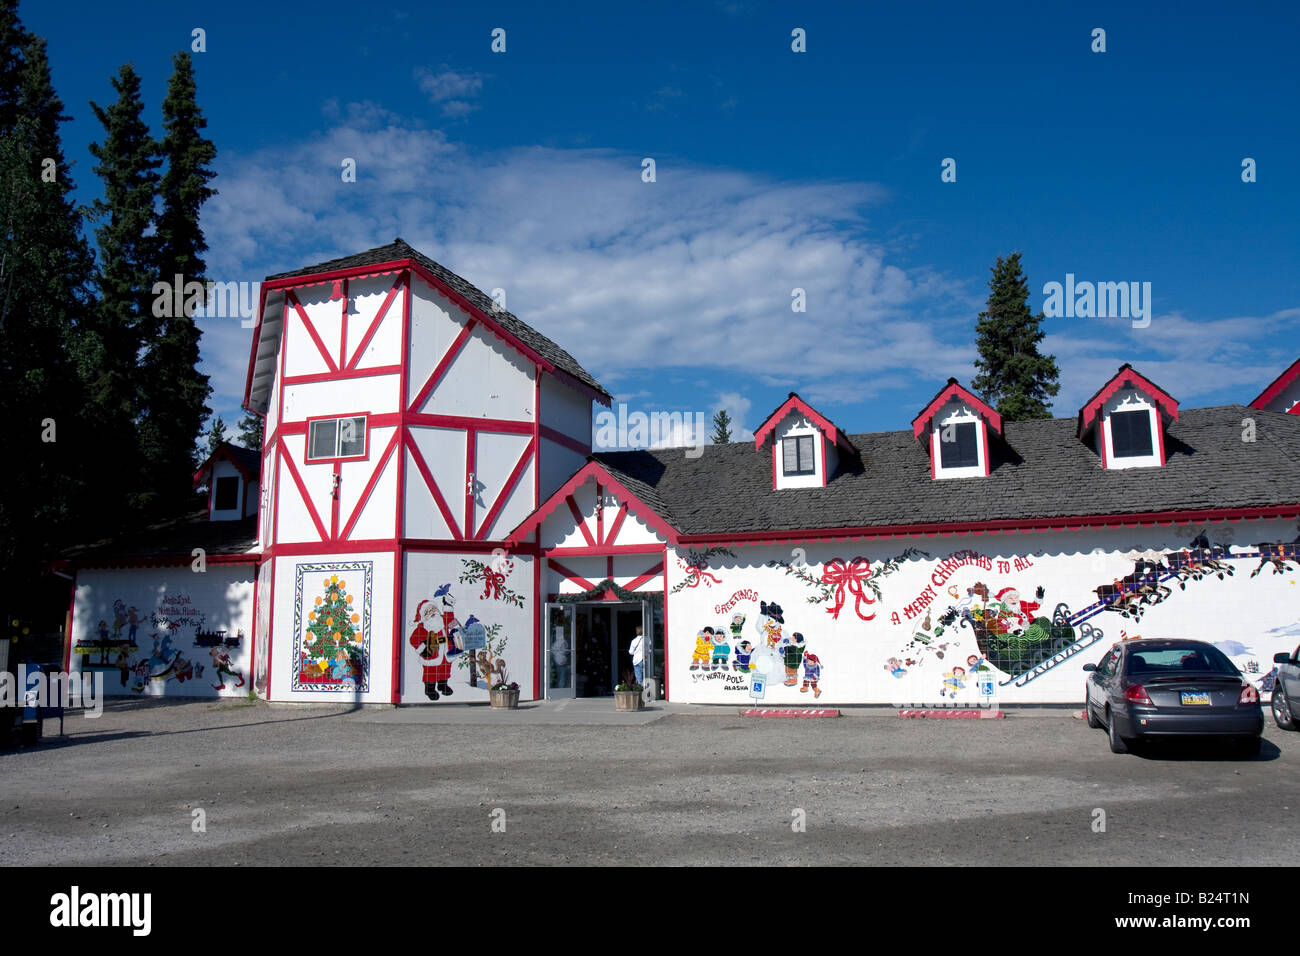 Santa Claus, father Christmas at North pole, Alaska Stock Photo ...